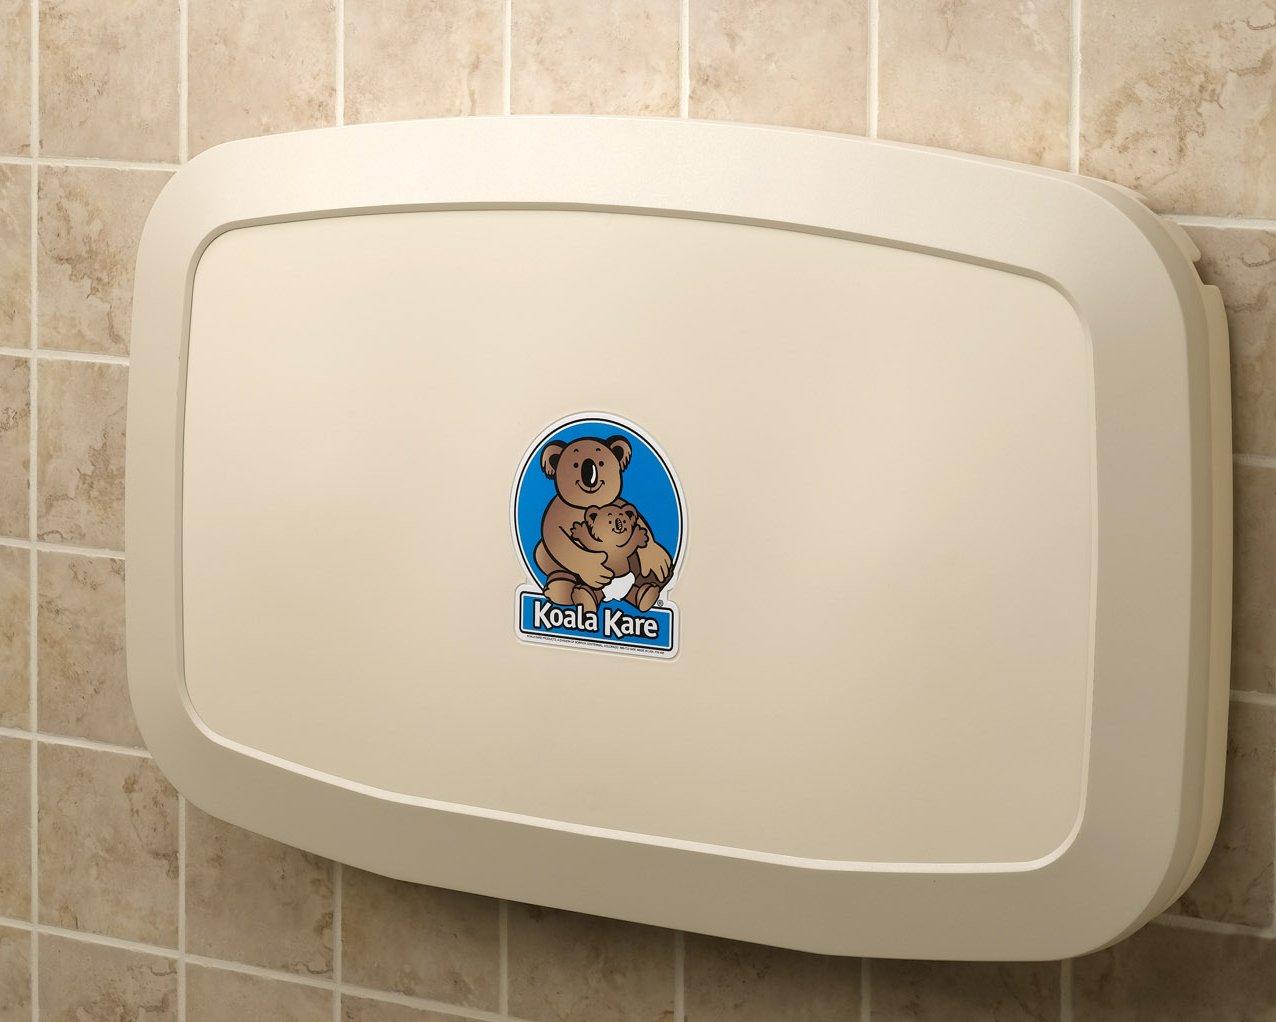 Koala Kare KB20000 Horizontal Baby Changing Station, 35 3/16 x 22 1/4, Cream